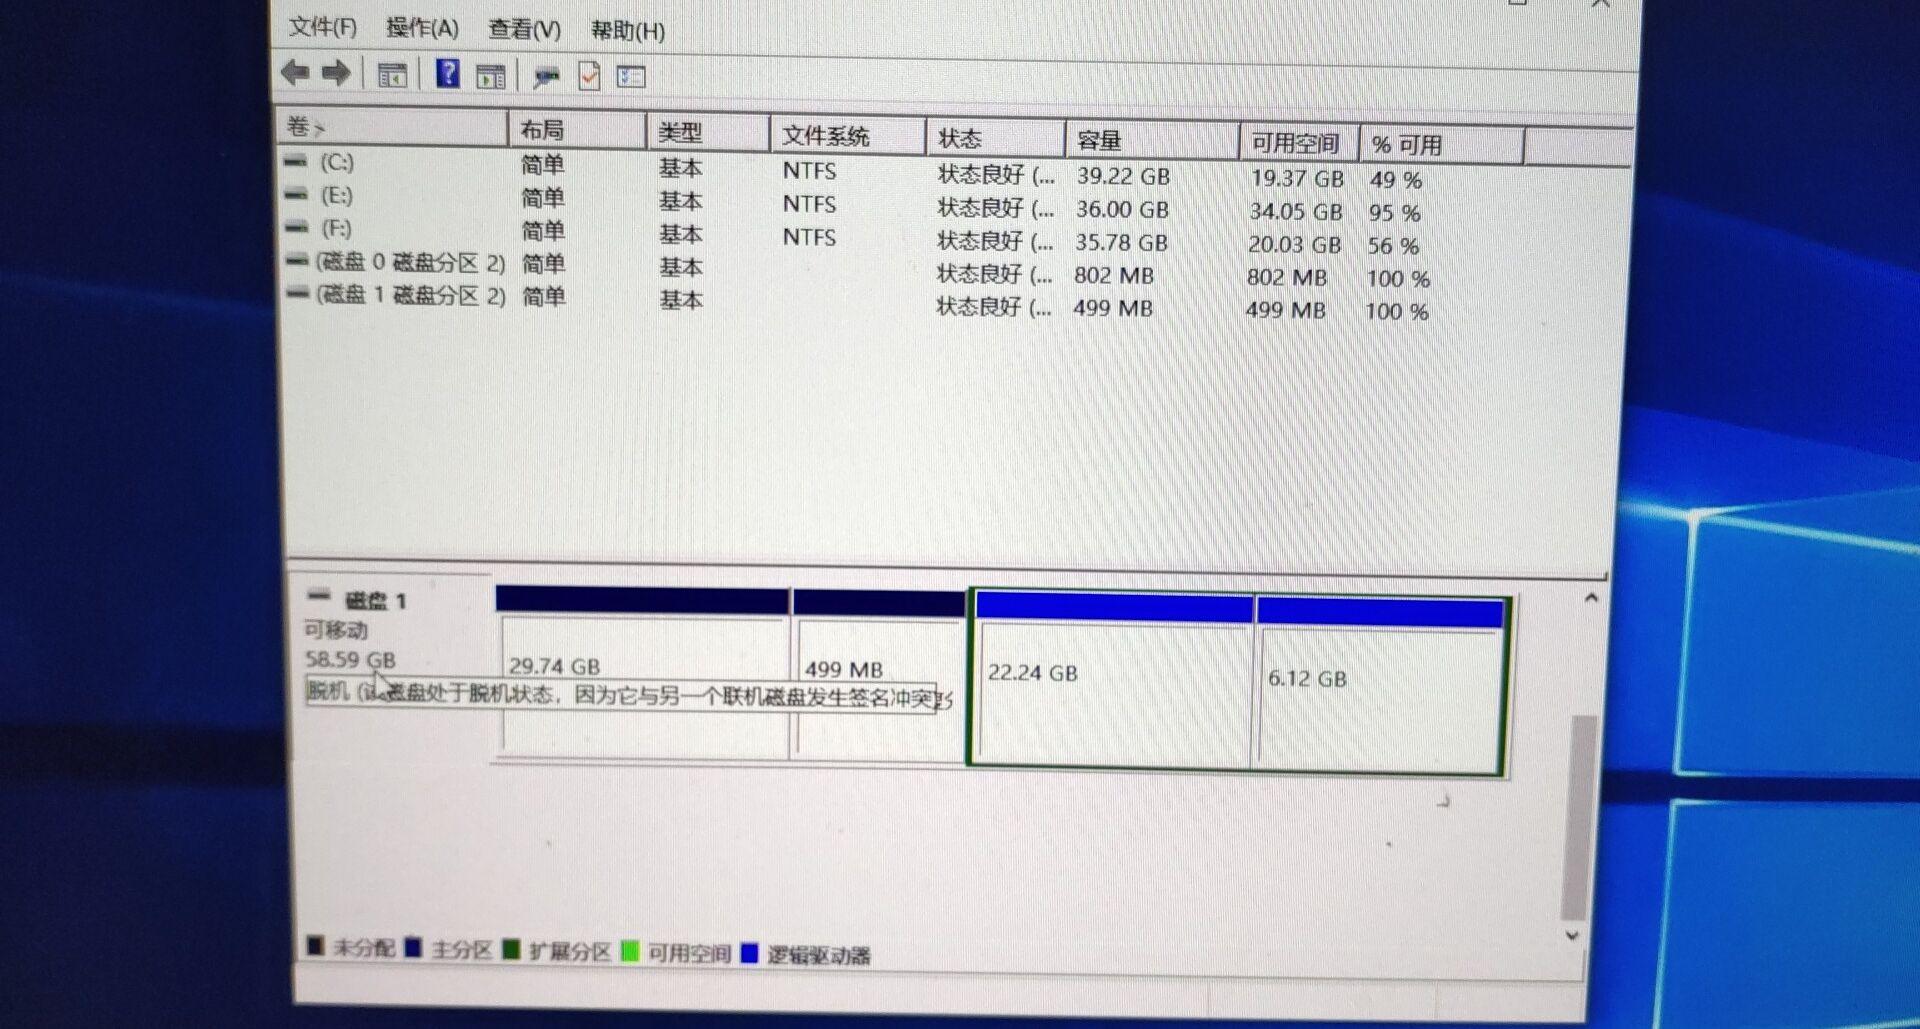 U盘脱机 ed5e6302-3e79-4f61-ab1b-ef179584f2c5?upload=true.jpg